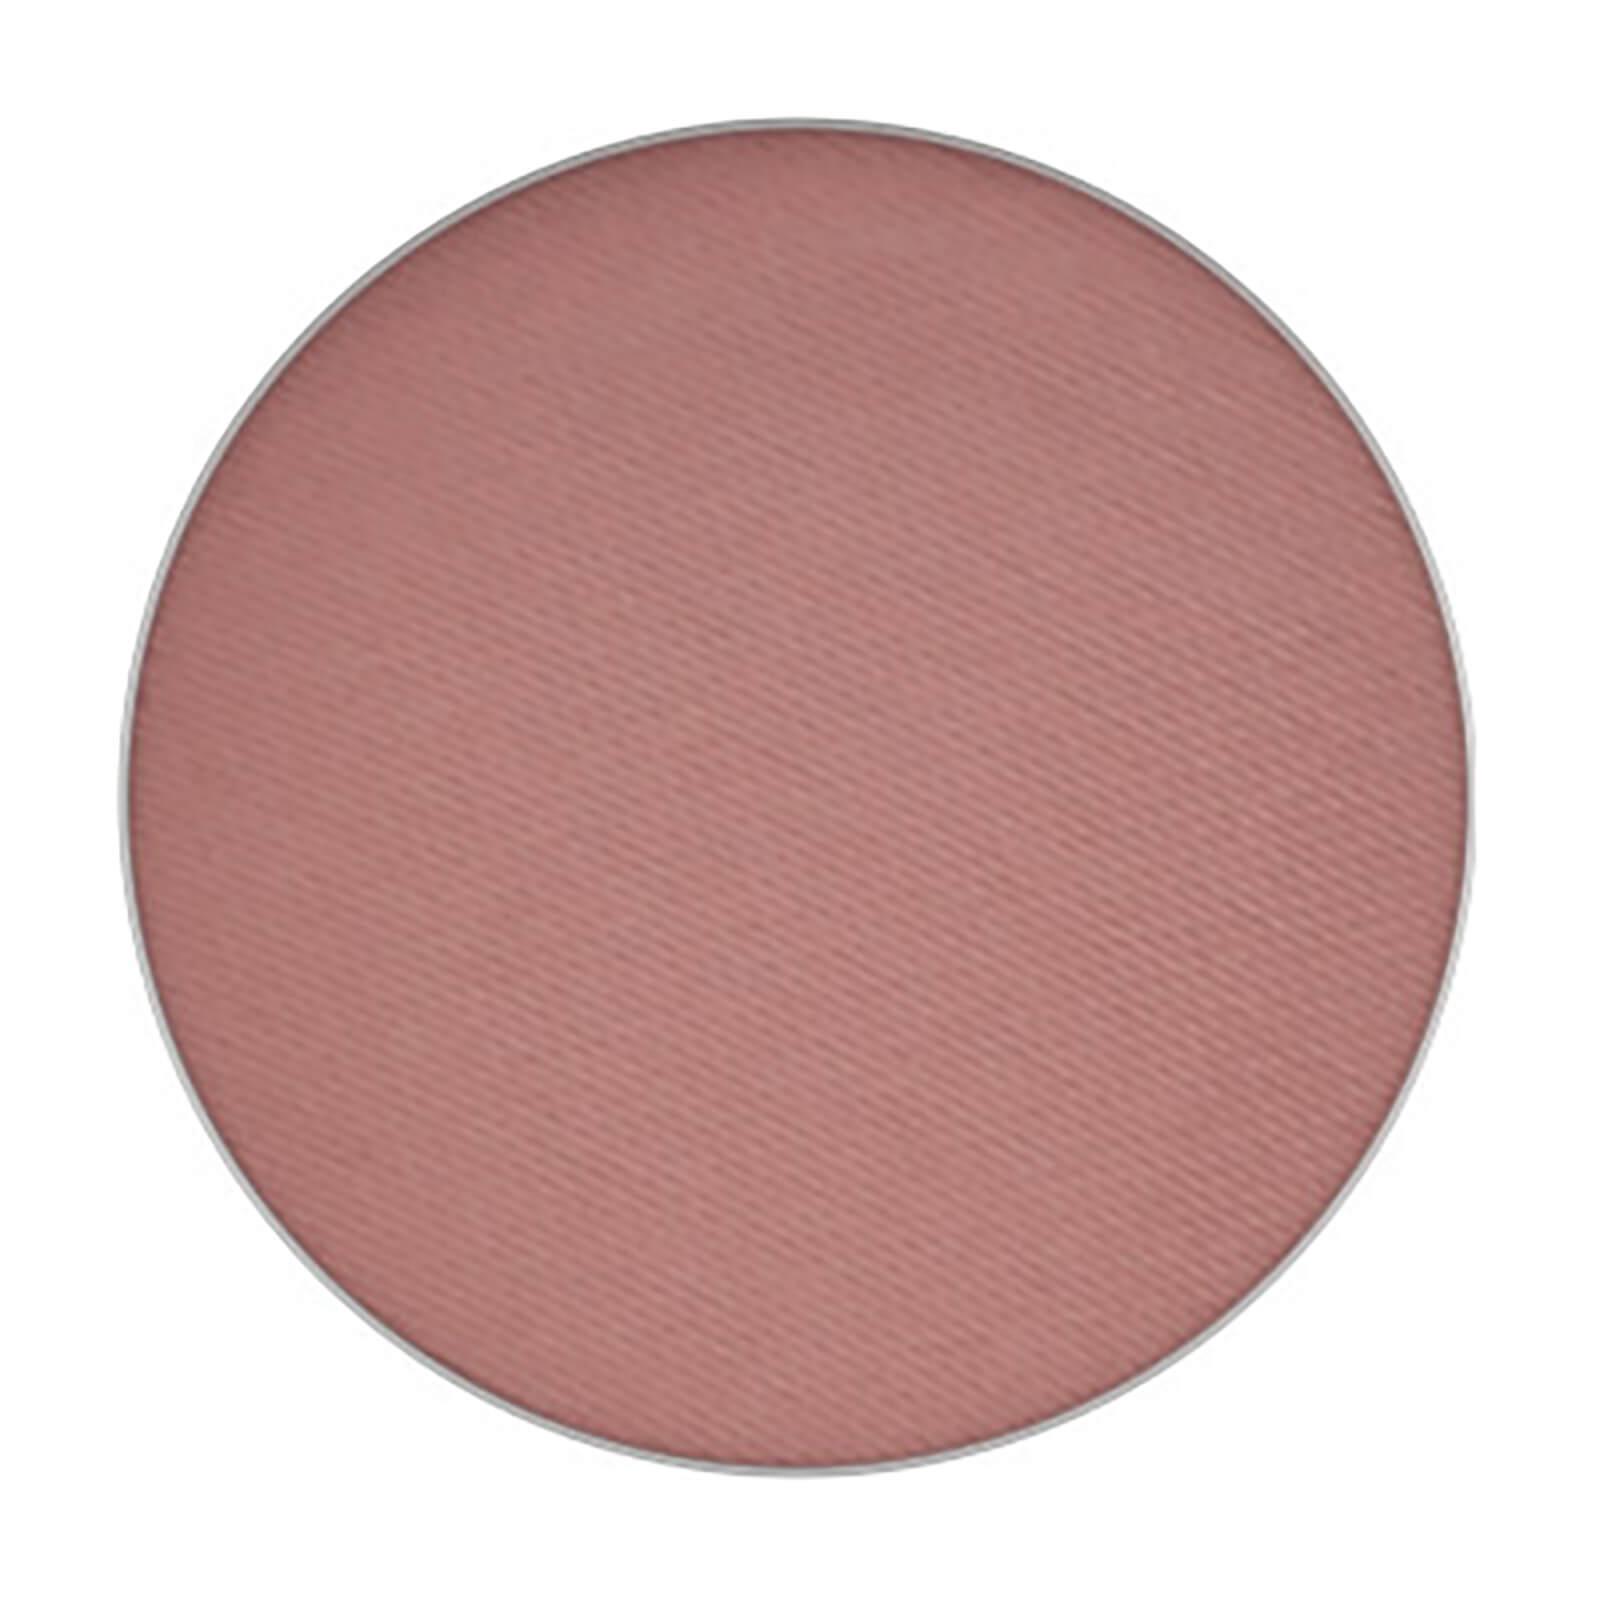 Mac Small Eye Shadow Pro Palette Refill - Matte - Swiss Chocolate